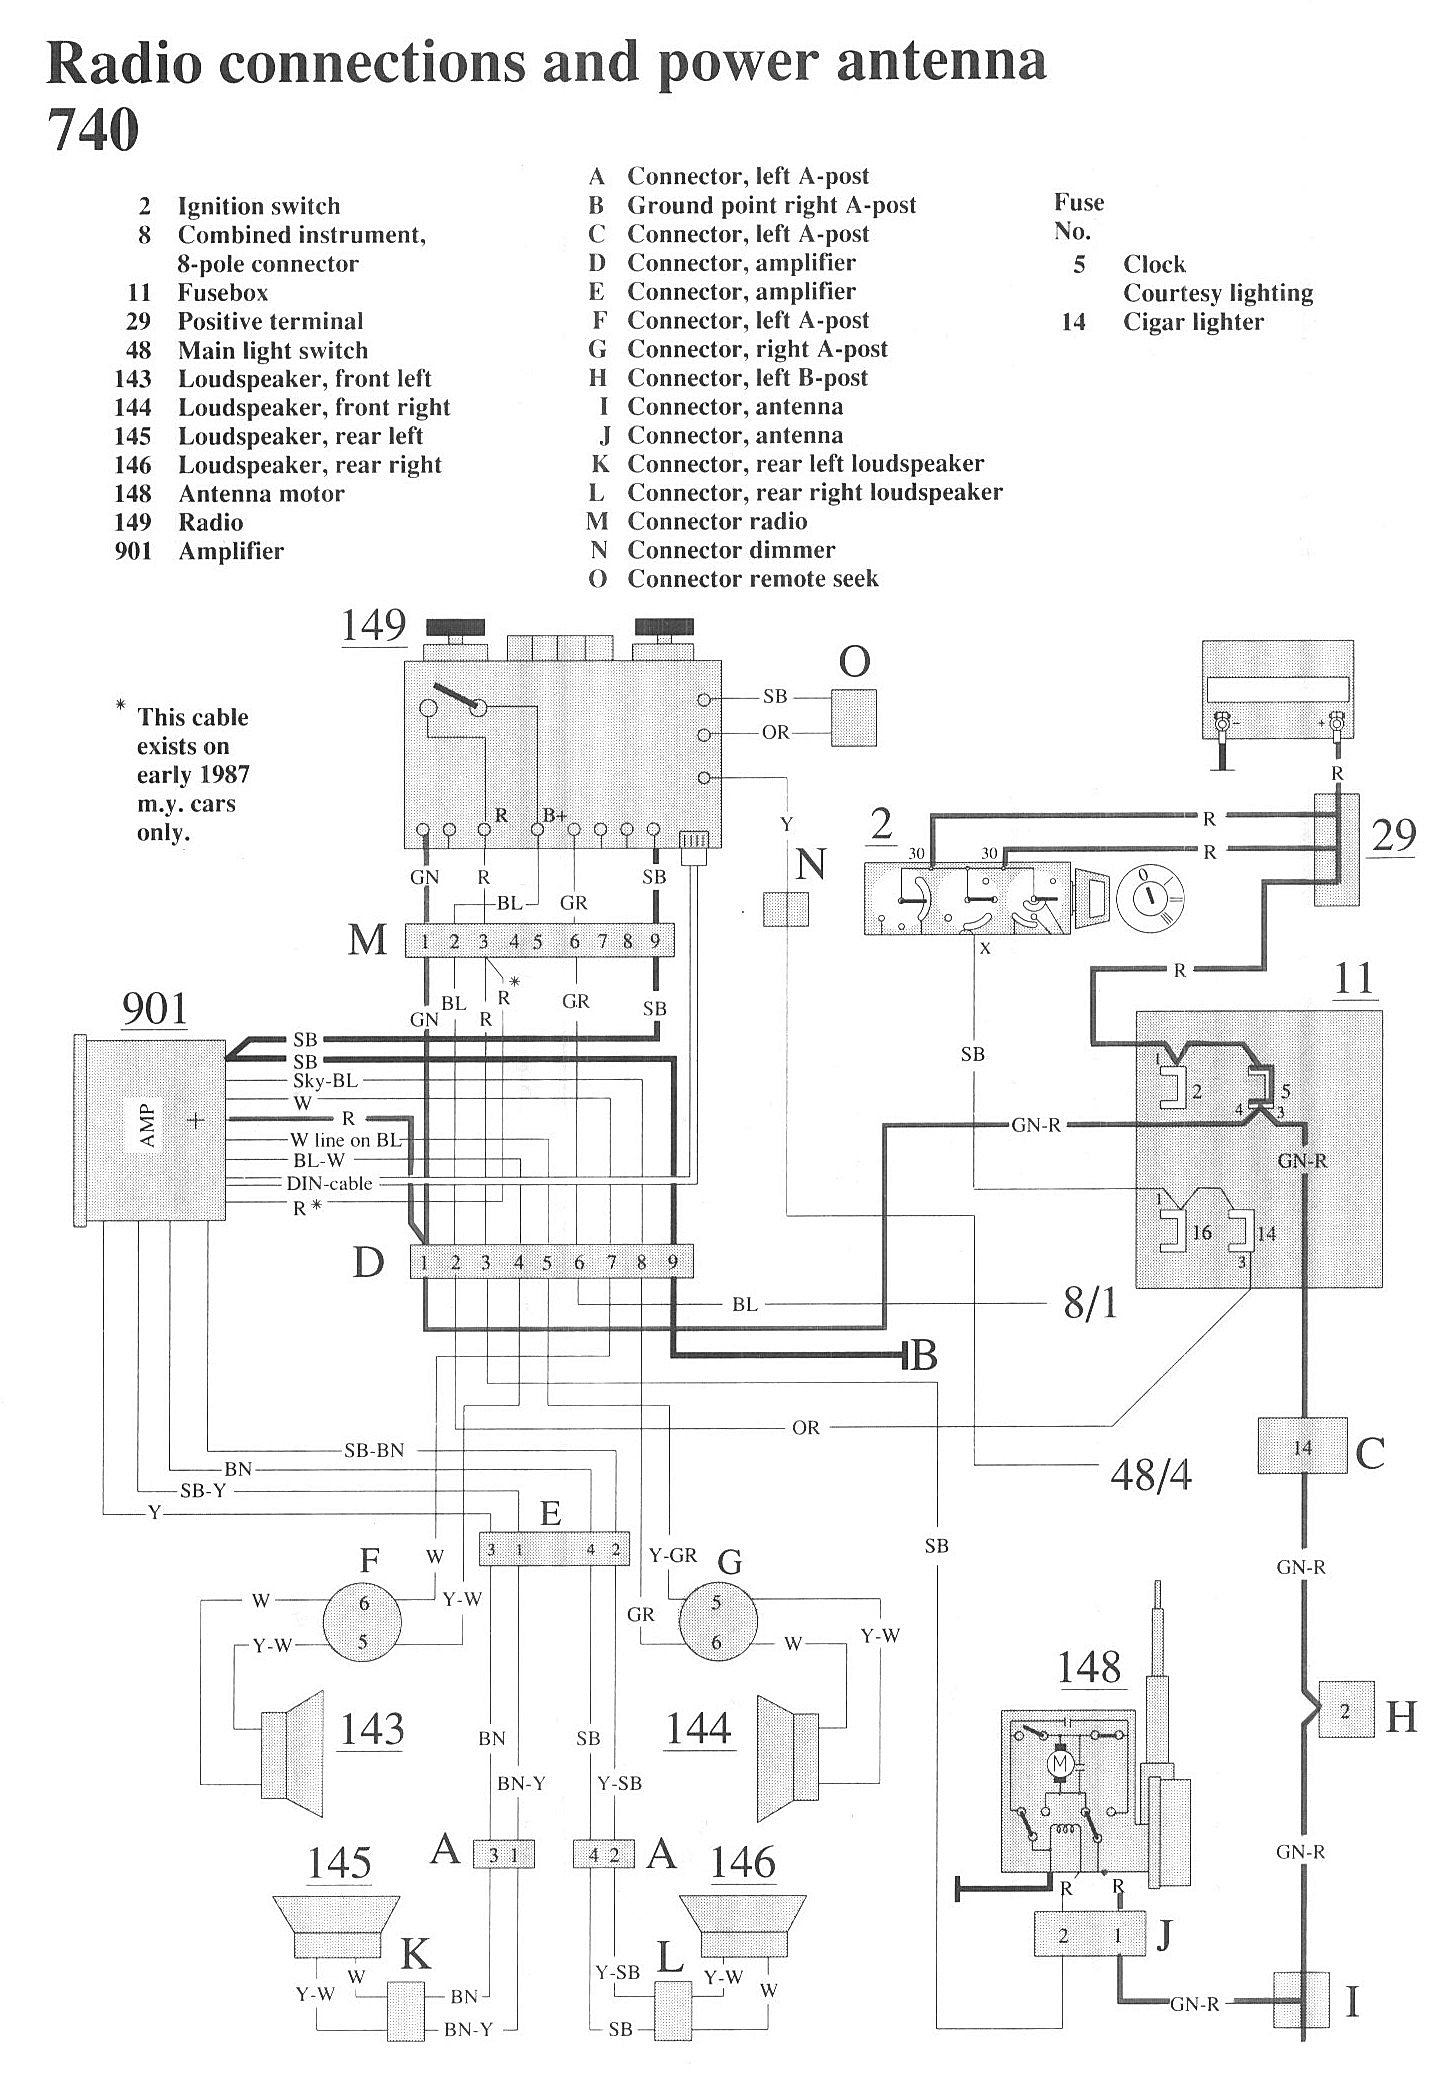 volvo 740 radio wiring diagram volvo image wiring volvo 740 gle kenwood radio cd checked wiring on volvo 740 radio wiring diagram